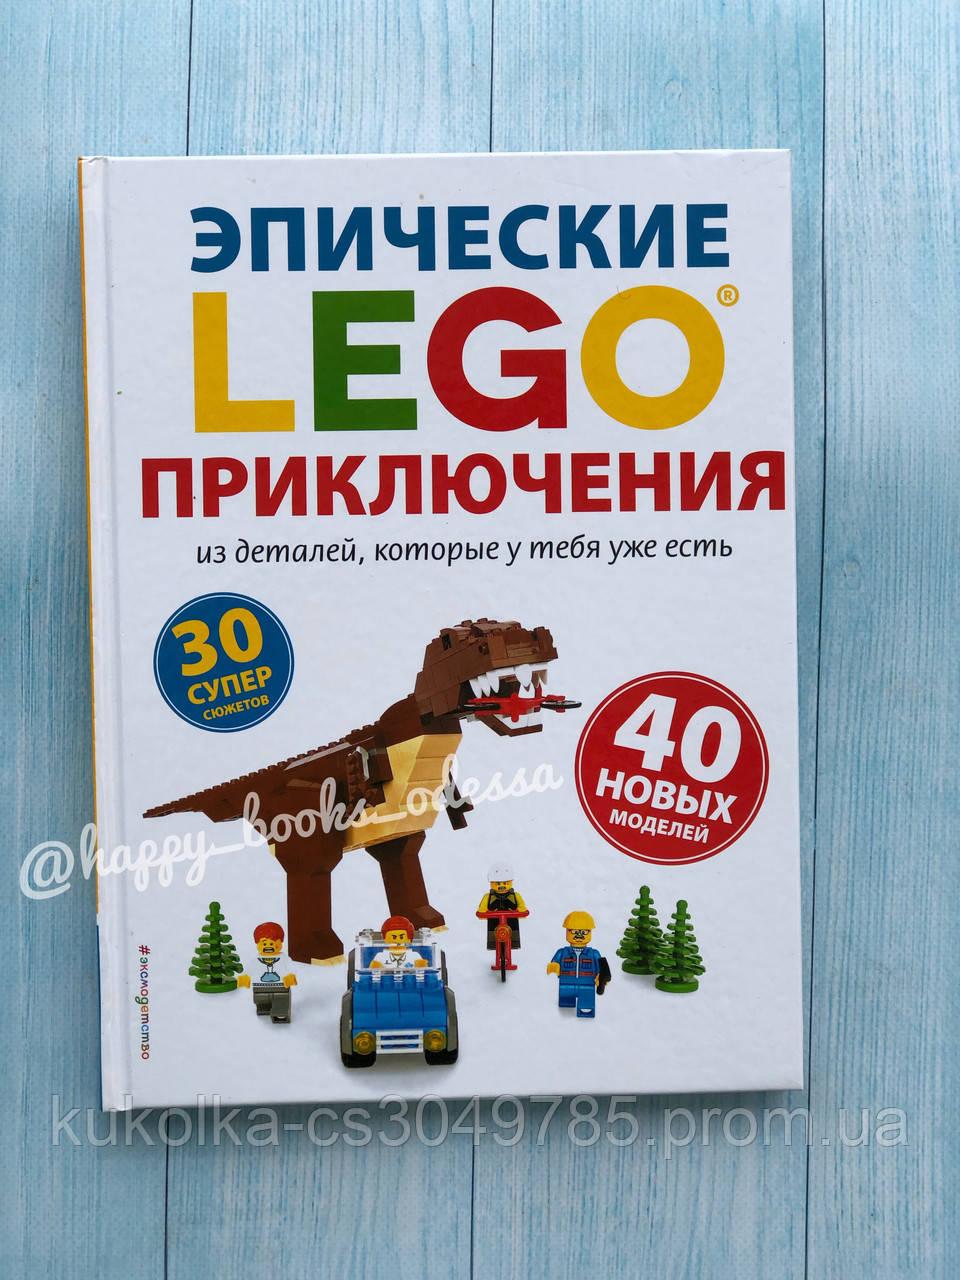 """Эпические LEGO приключения"" ЭКСМО, фото 1"